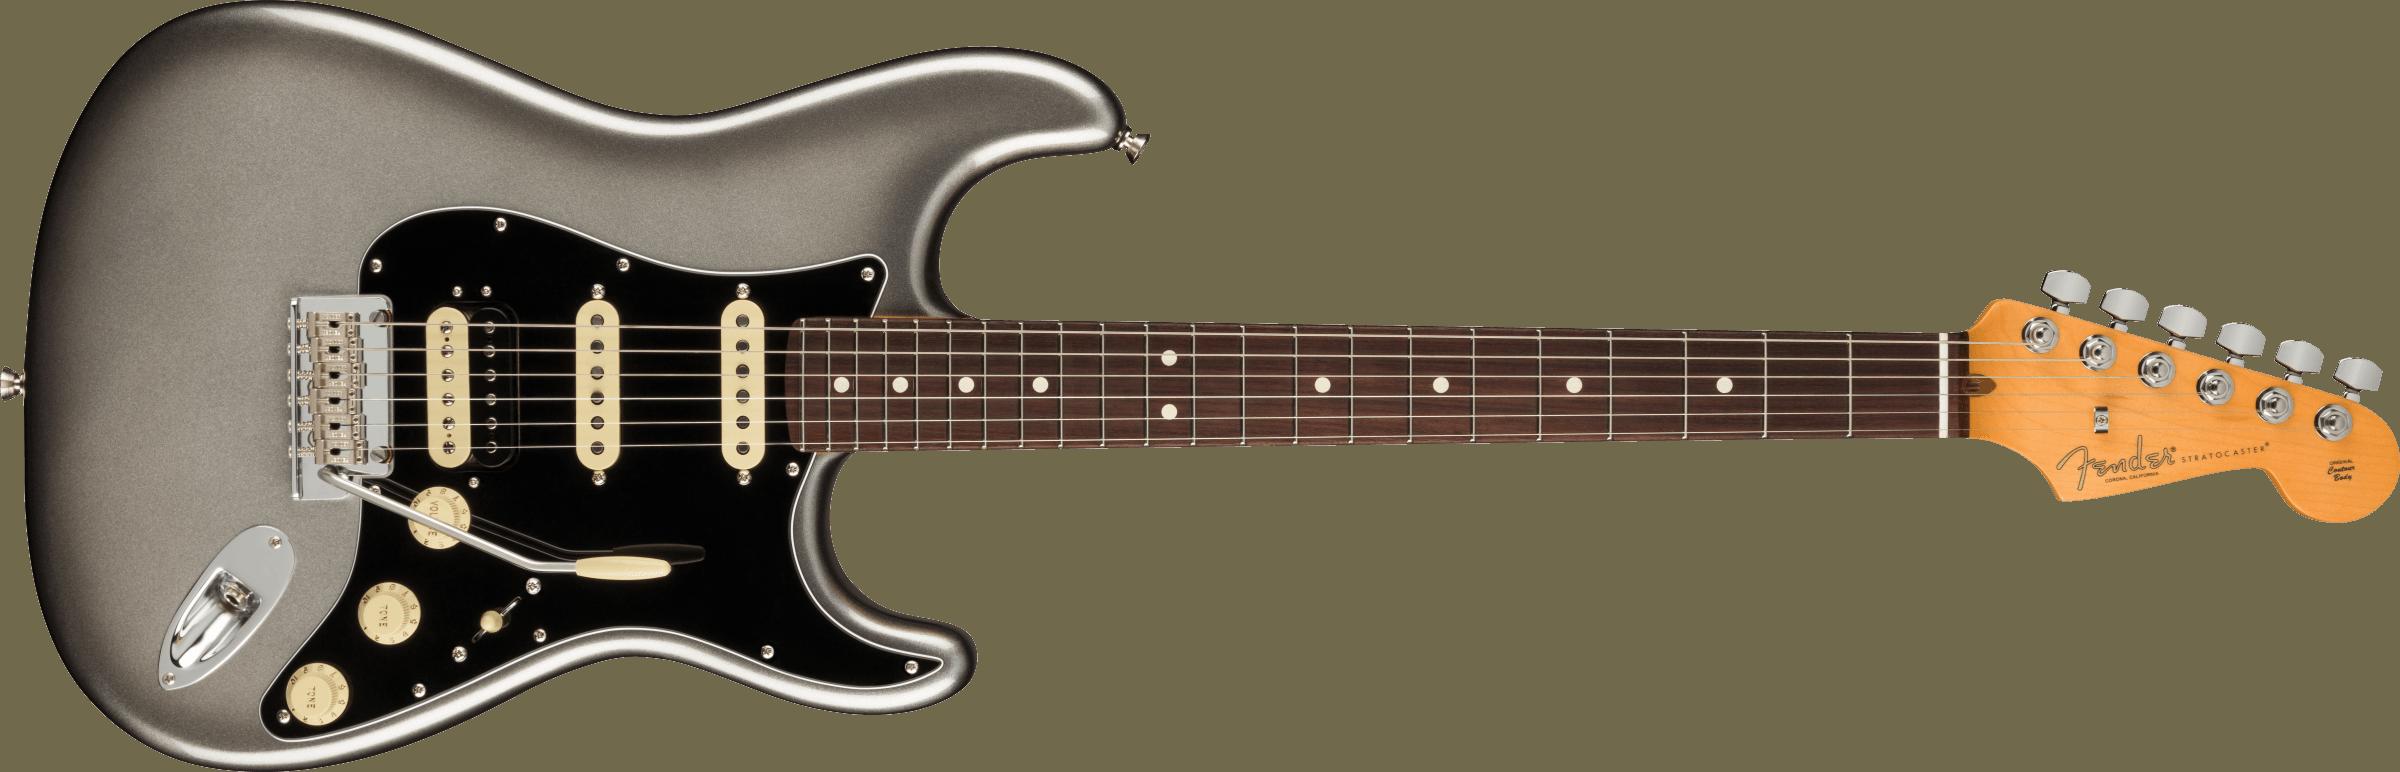 FENDER-American-Professional-II-Stratocaster-HSS-Rosewood-Fingerboard-Mercury-sku-571005538